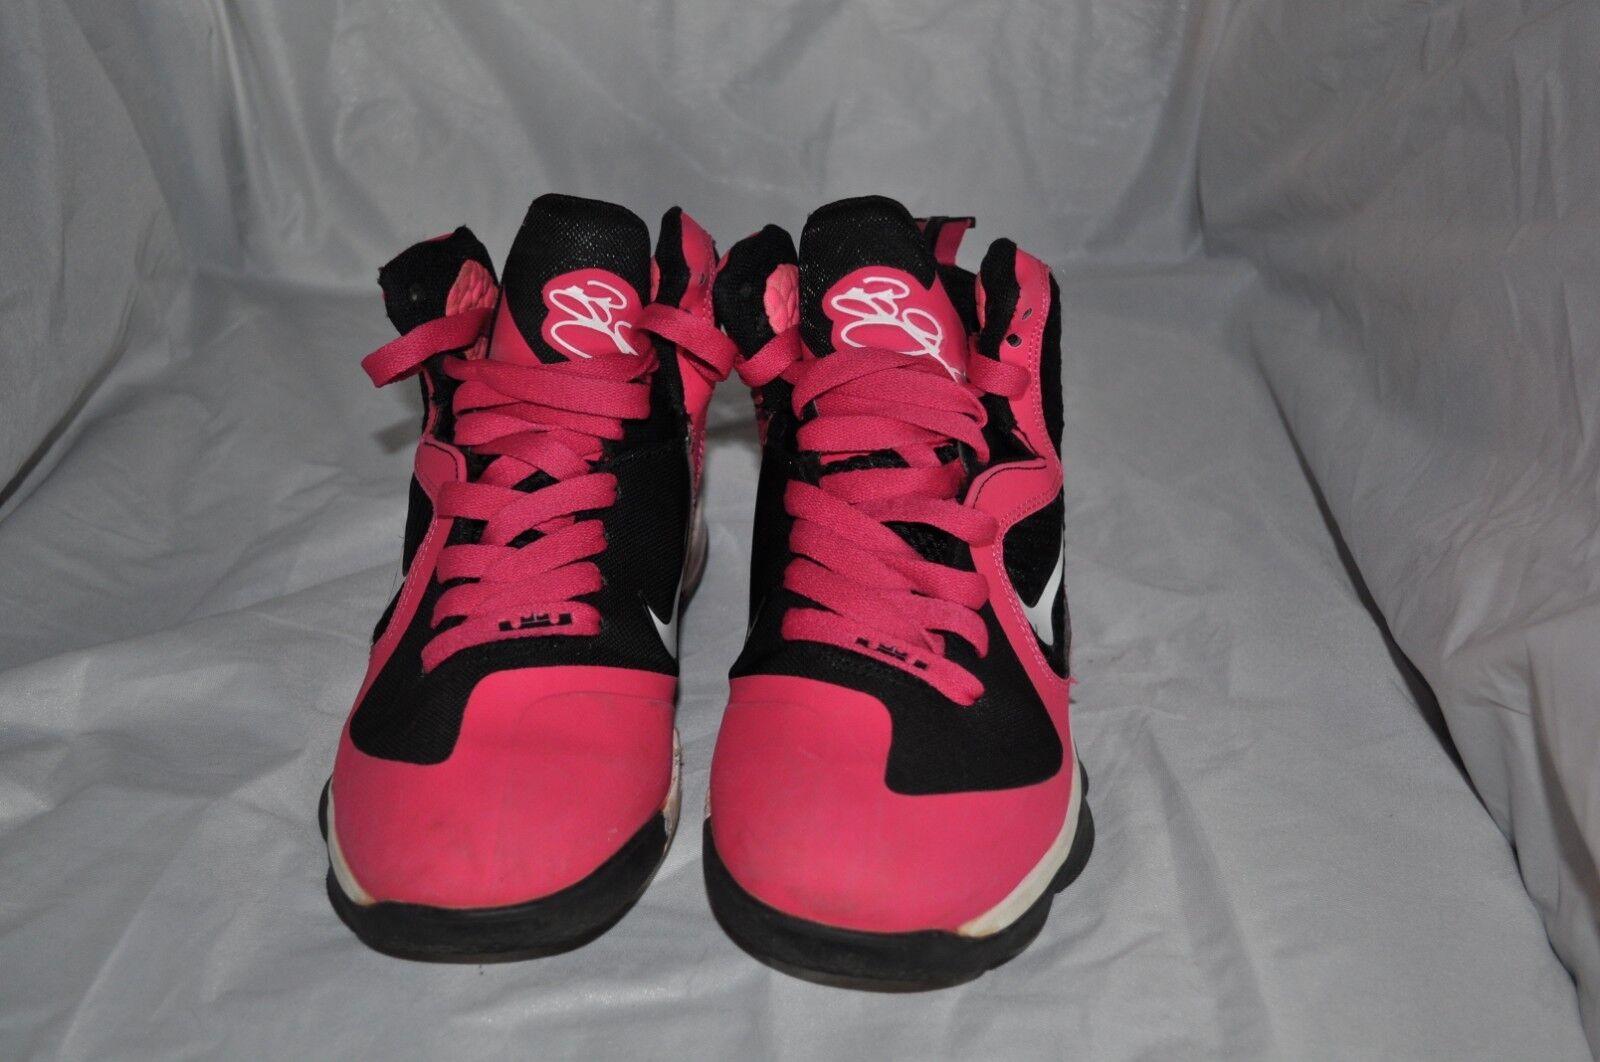 Nike Air Max Zoom Lebron Lebron Zoom 9 Sneaker Gr 38 Farbe neon pink/schwarz/weiss e6cefa